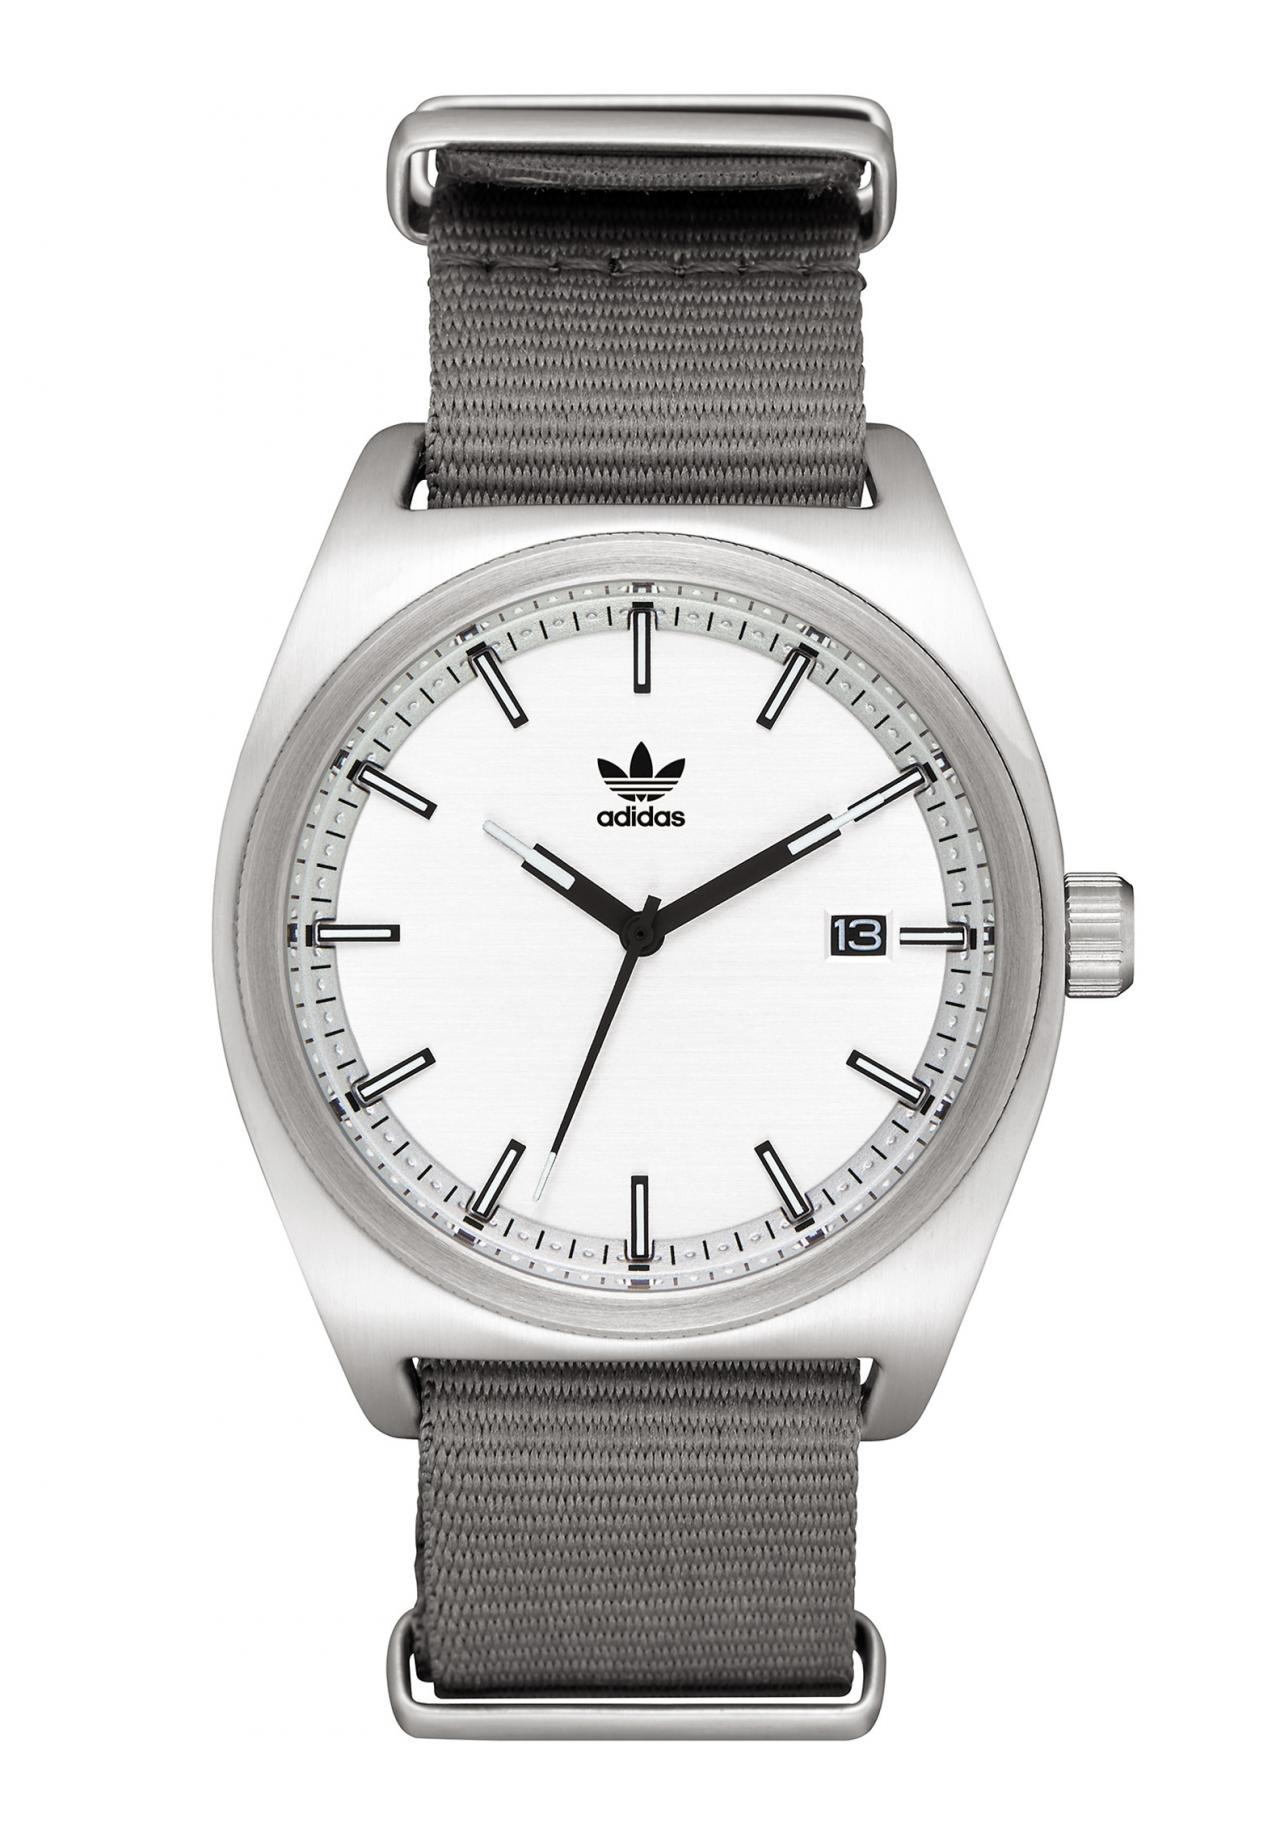 Adidas Process Silver / Black / Gray Armbanduhr